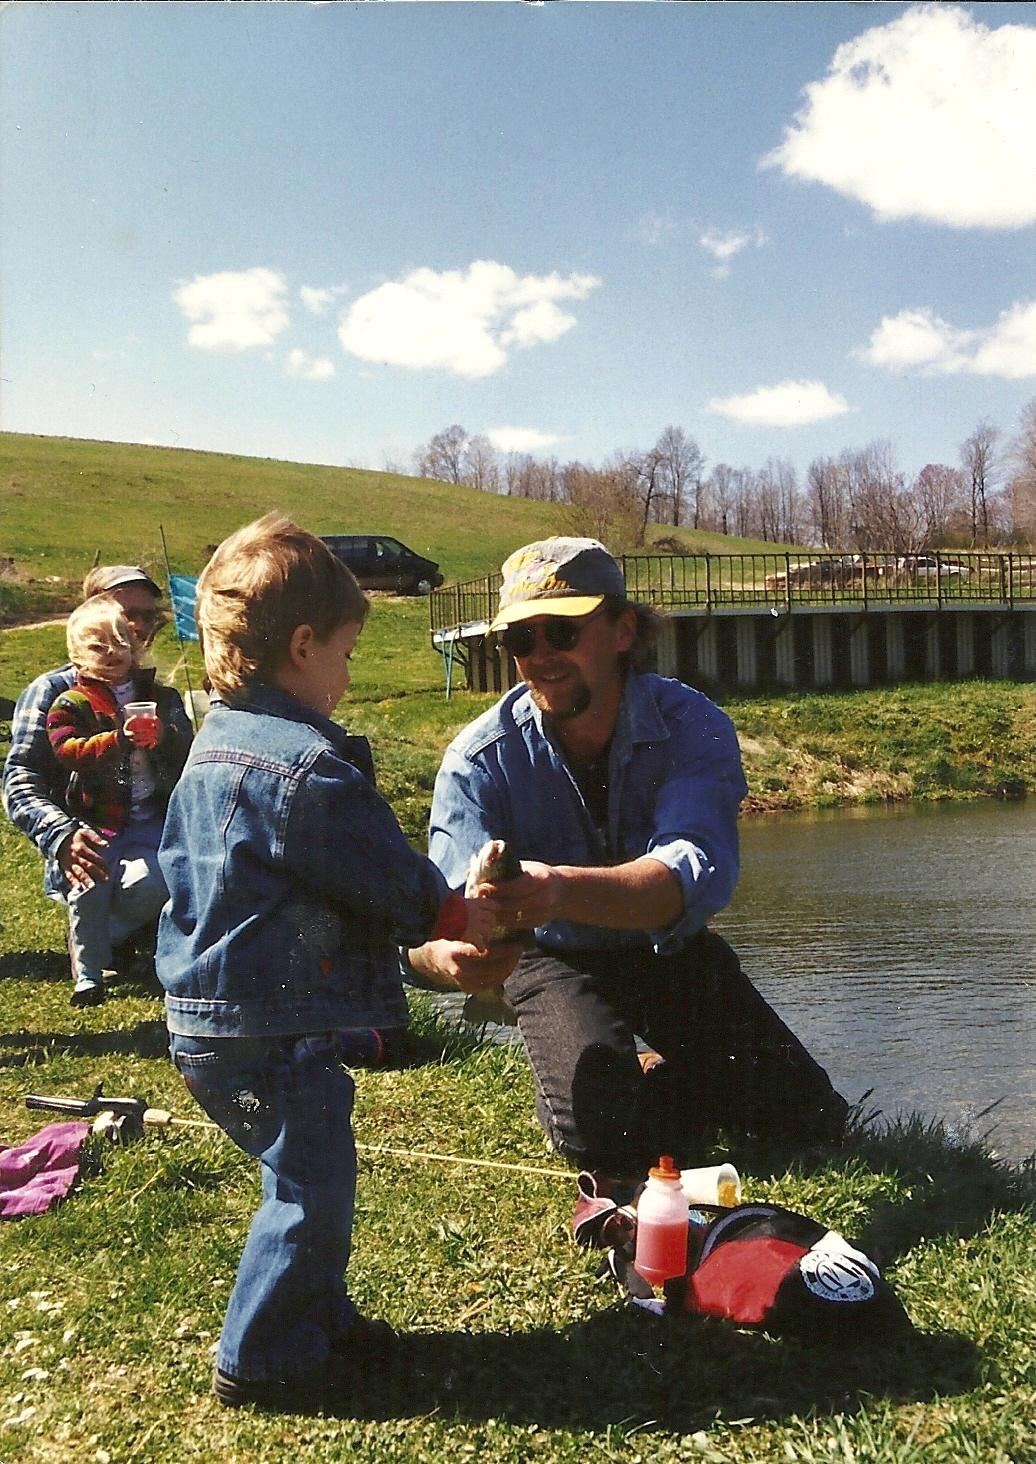 Cameron county pa news fishing season is here for Pa fishing season